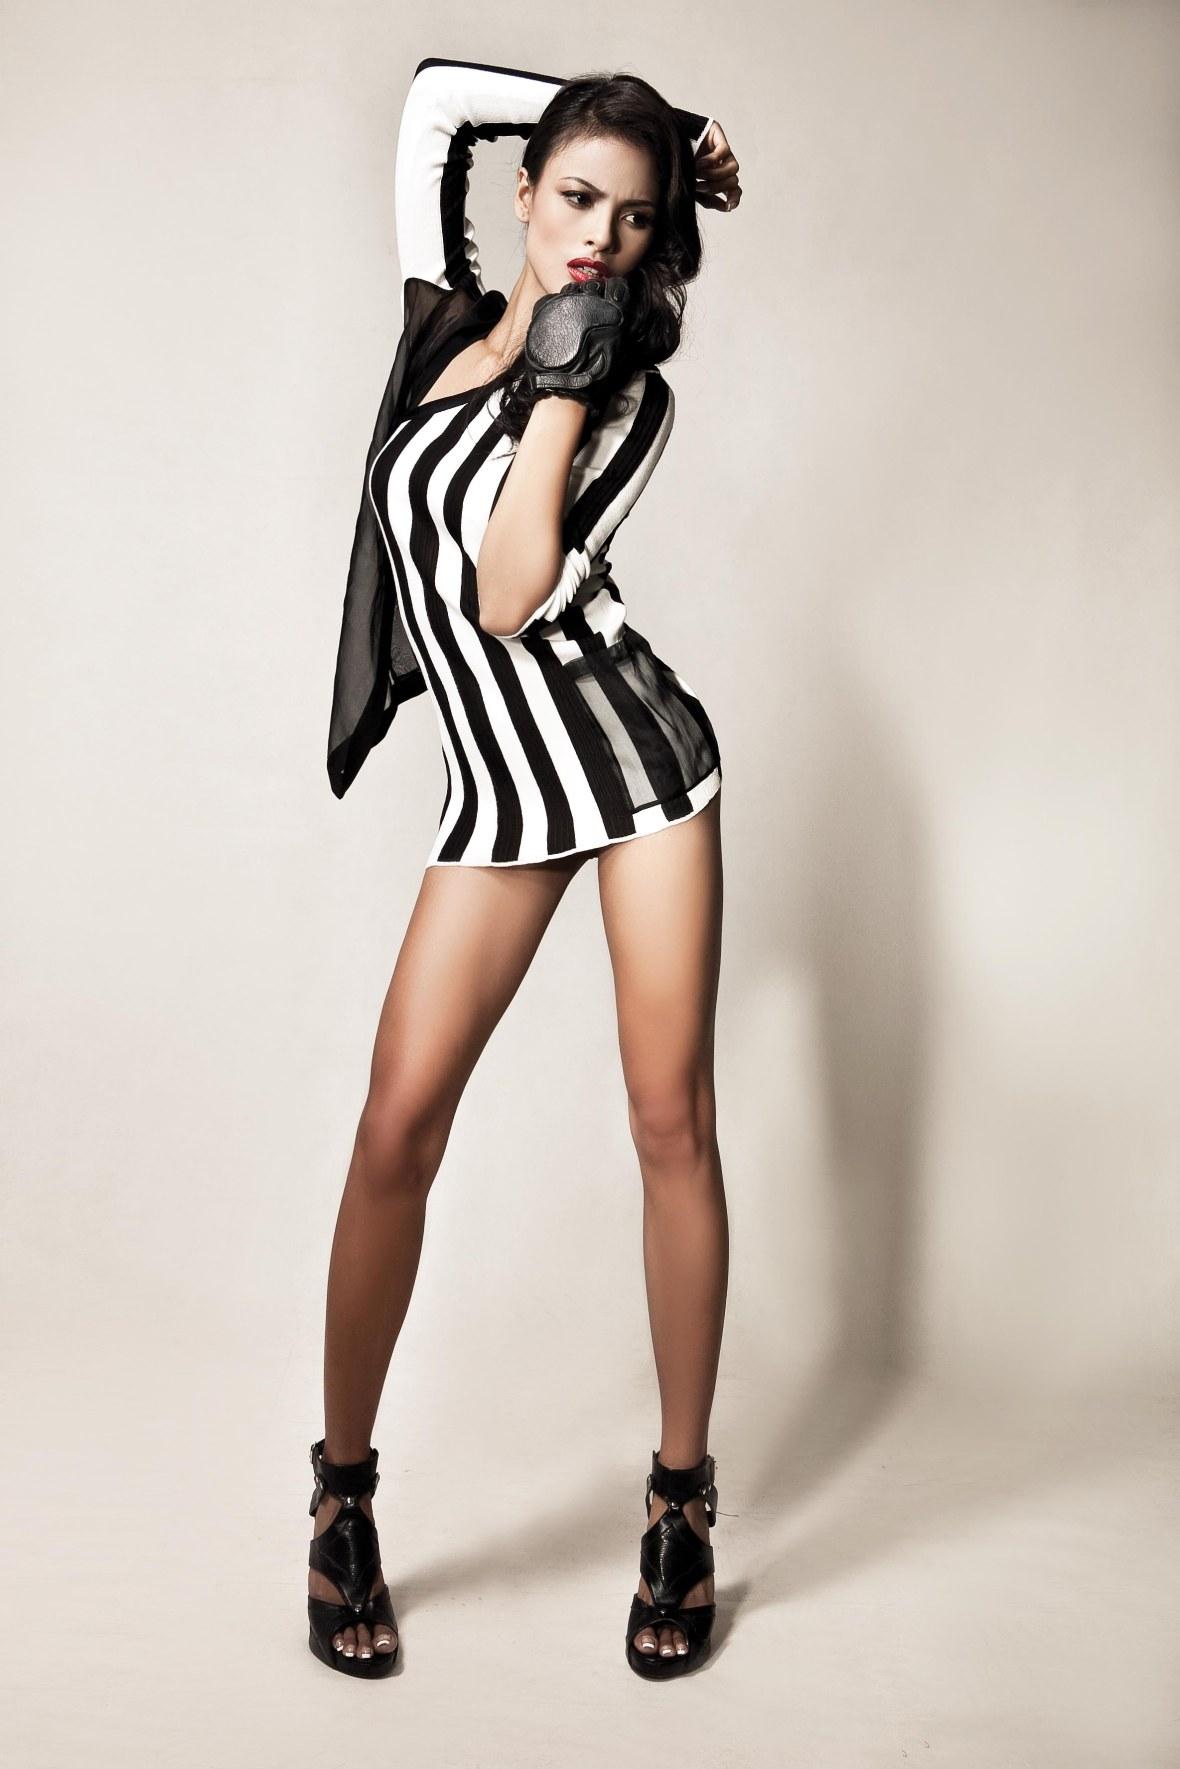 Isabeli_V@MSI Modeling Agency in Bangkok Thailand_By Miss Josie Sang (30)